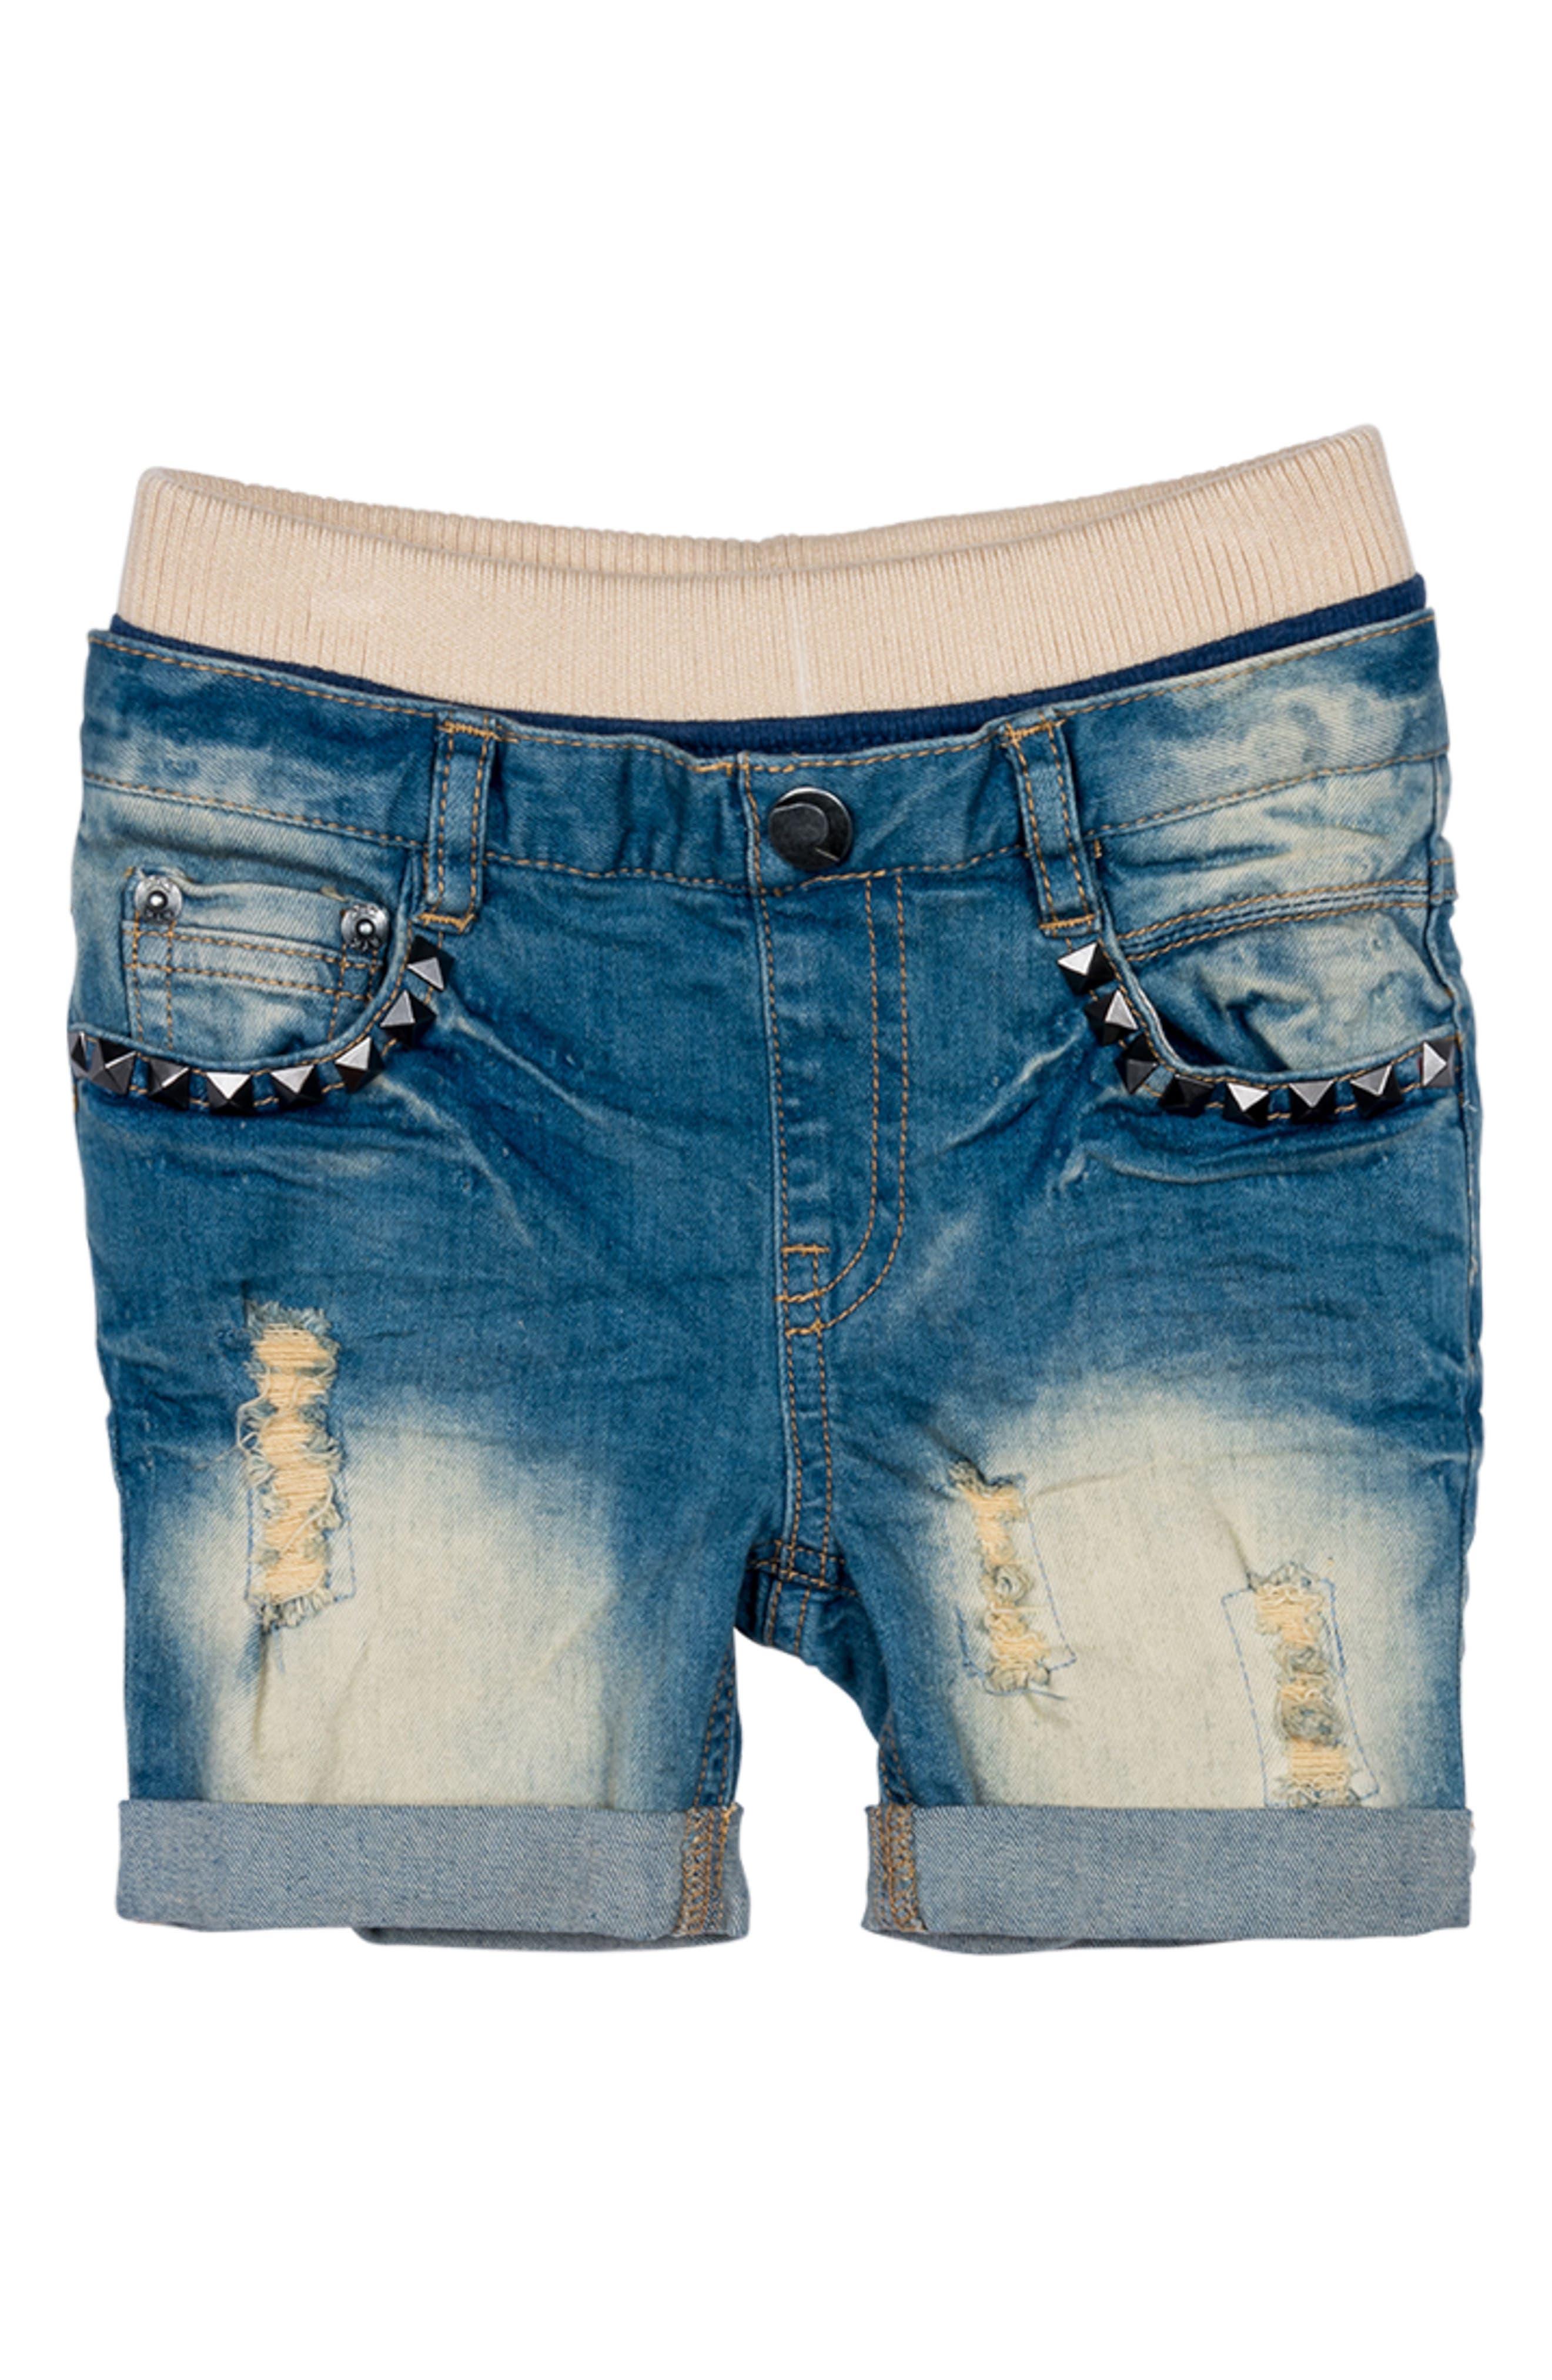 Heavy Metal Denim Shorts,                             Main thumbnail 1, color,                             Blue Denim